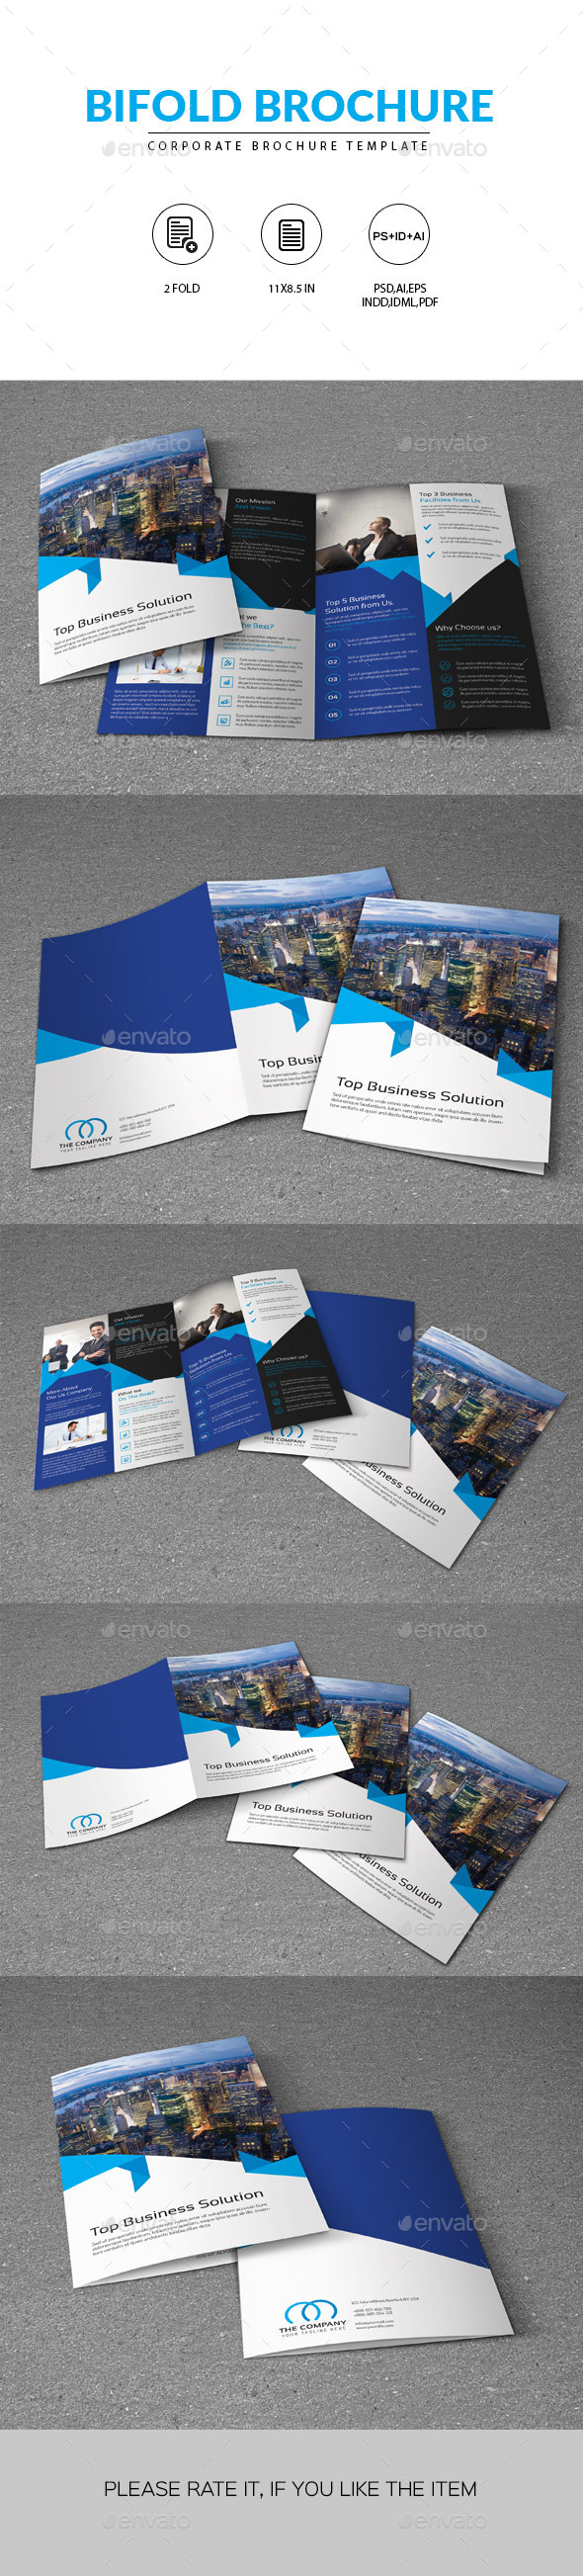 Corporate Bifold Brochure Template - Corporate Brochures